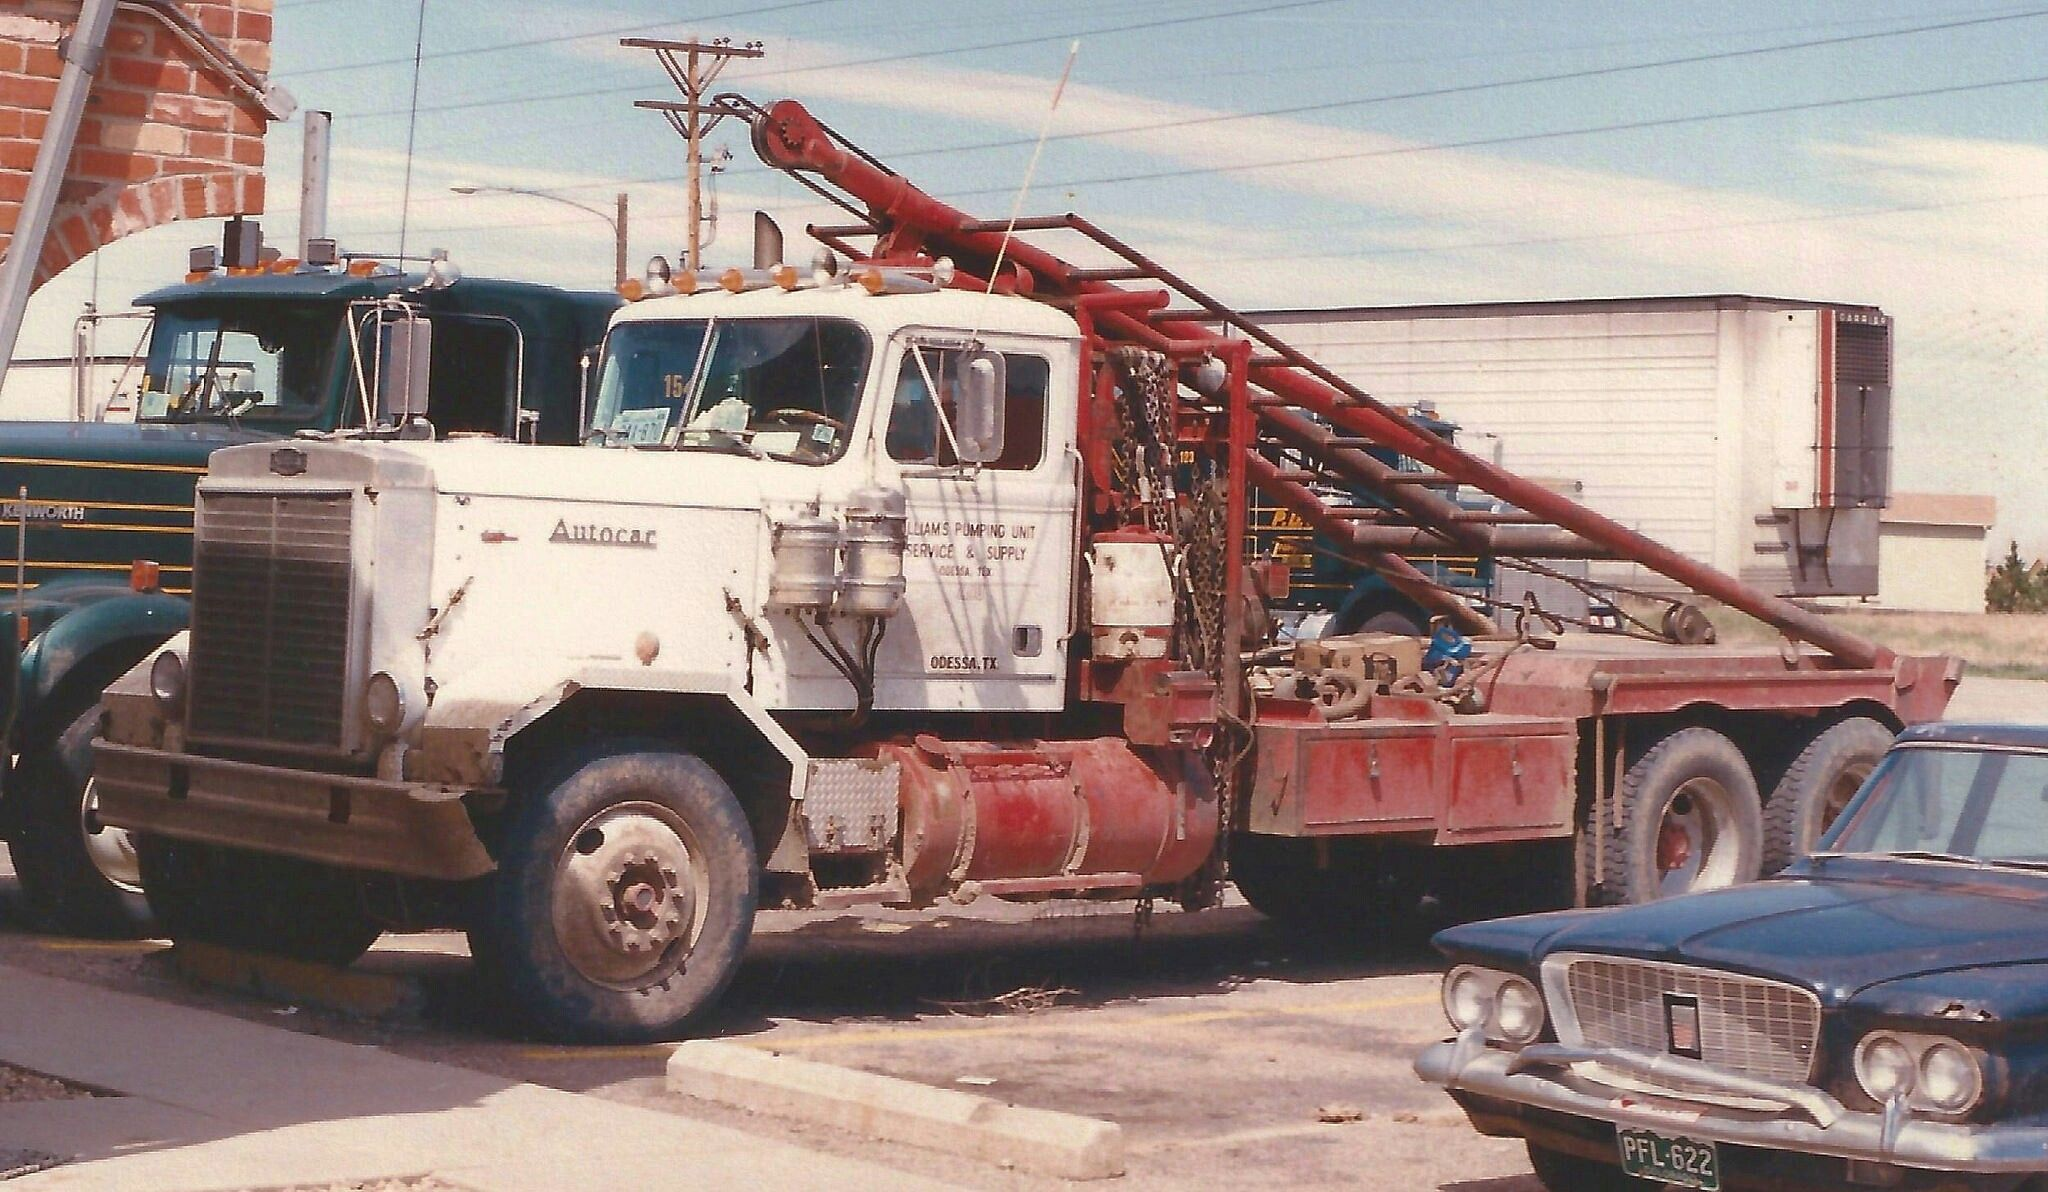 Pin by John Luckfield on Oilfield | Trucks, Big trucks, Rigs